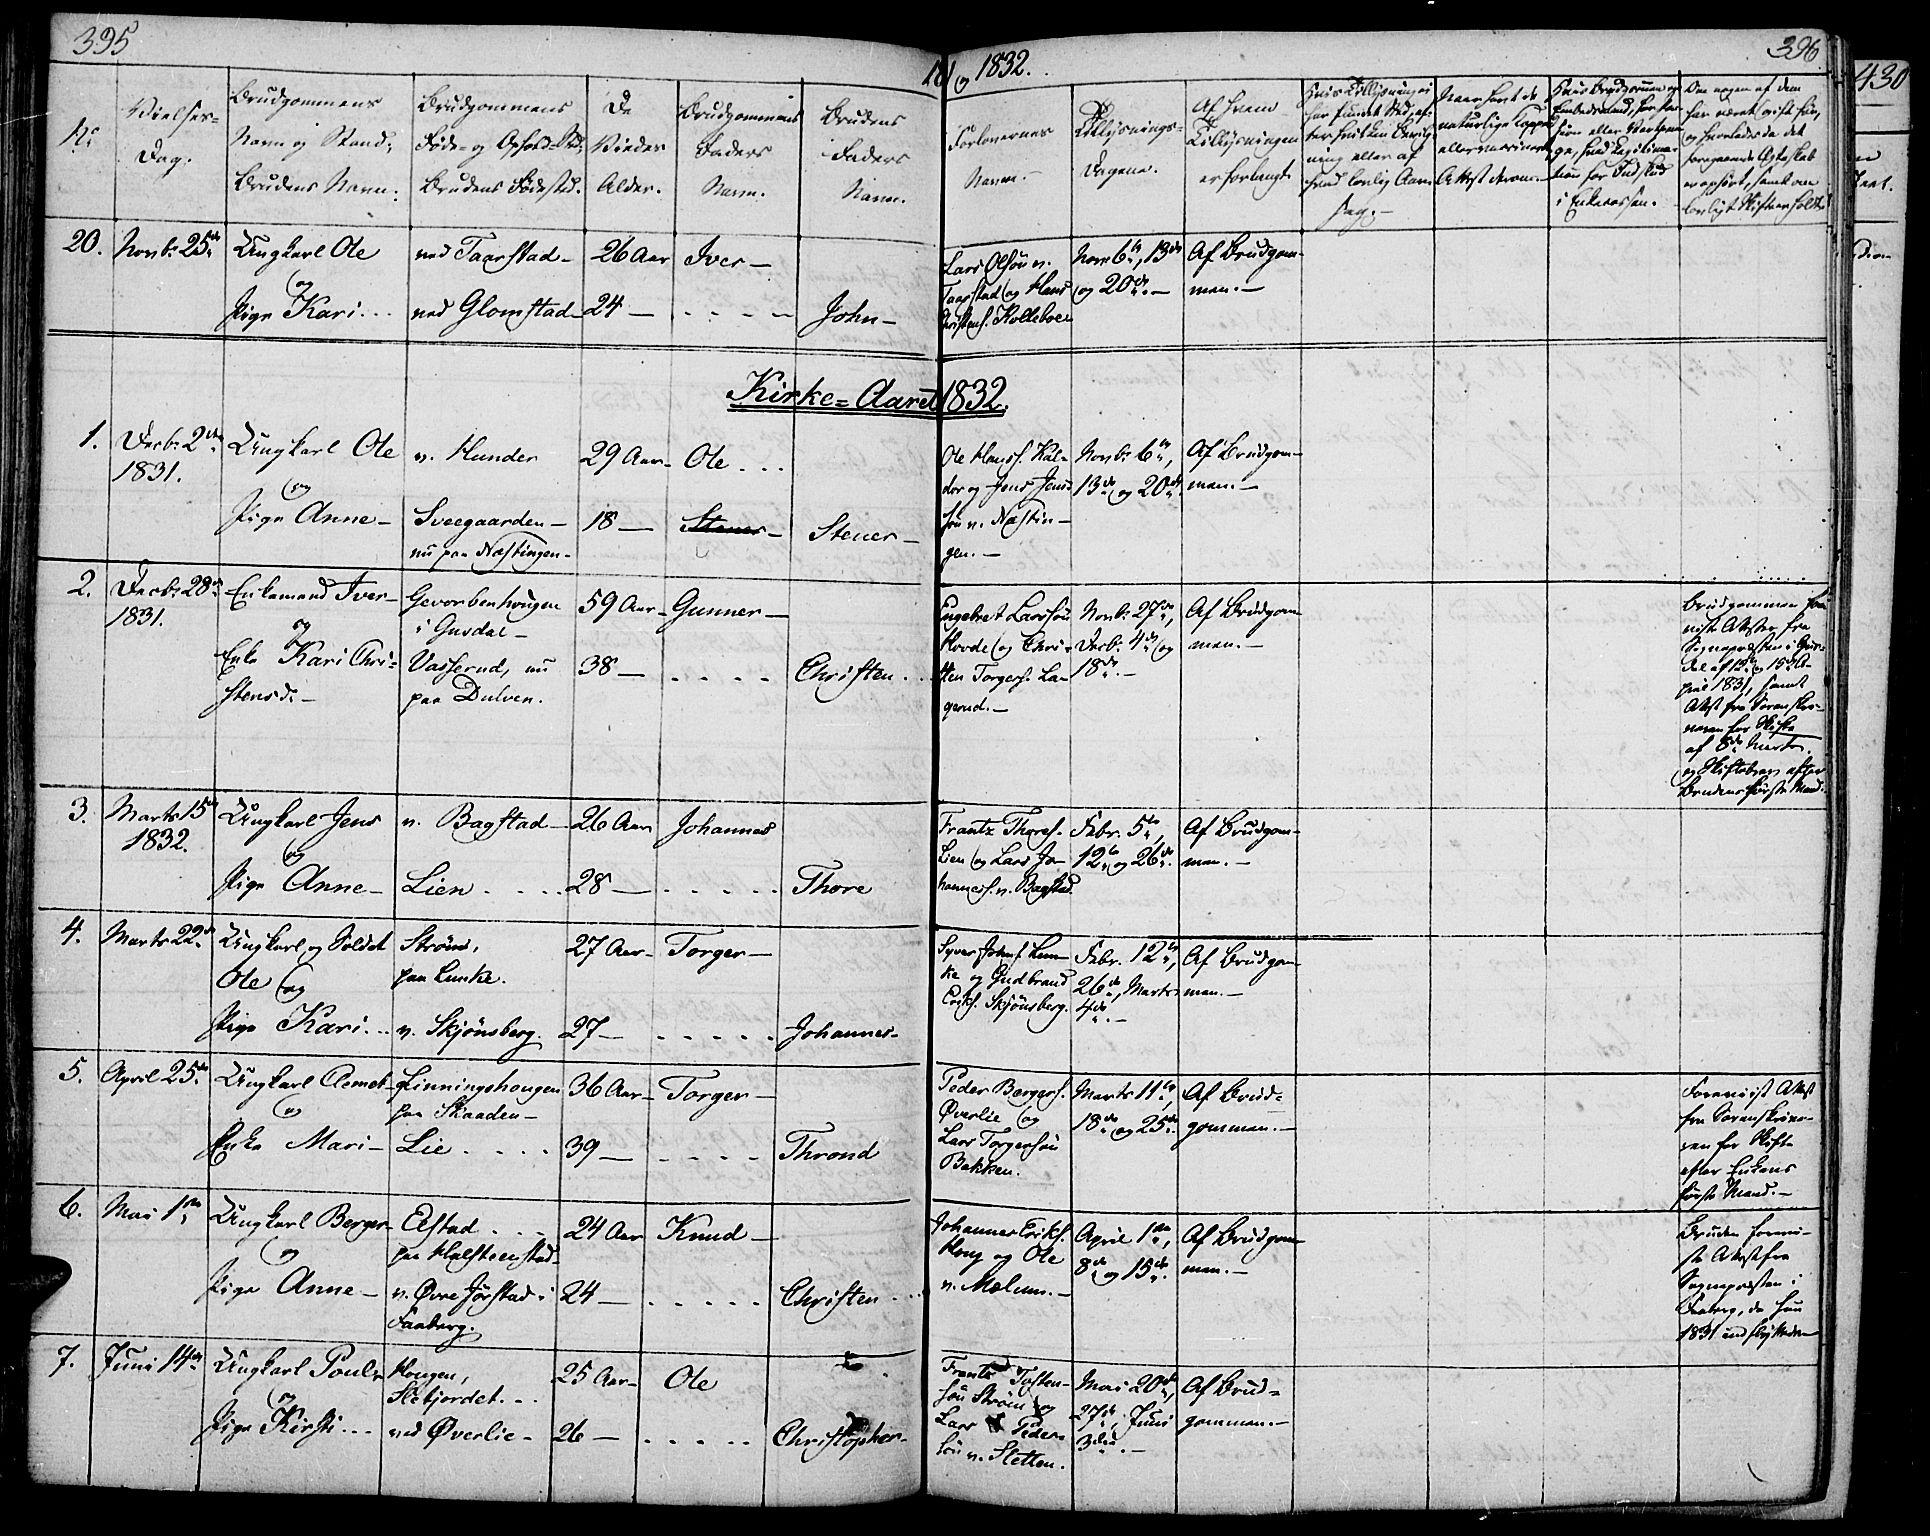 SAH, Øyer prestekontor, Ministerialbok nr. 4, 1824-1841, s. 395-396